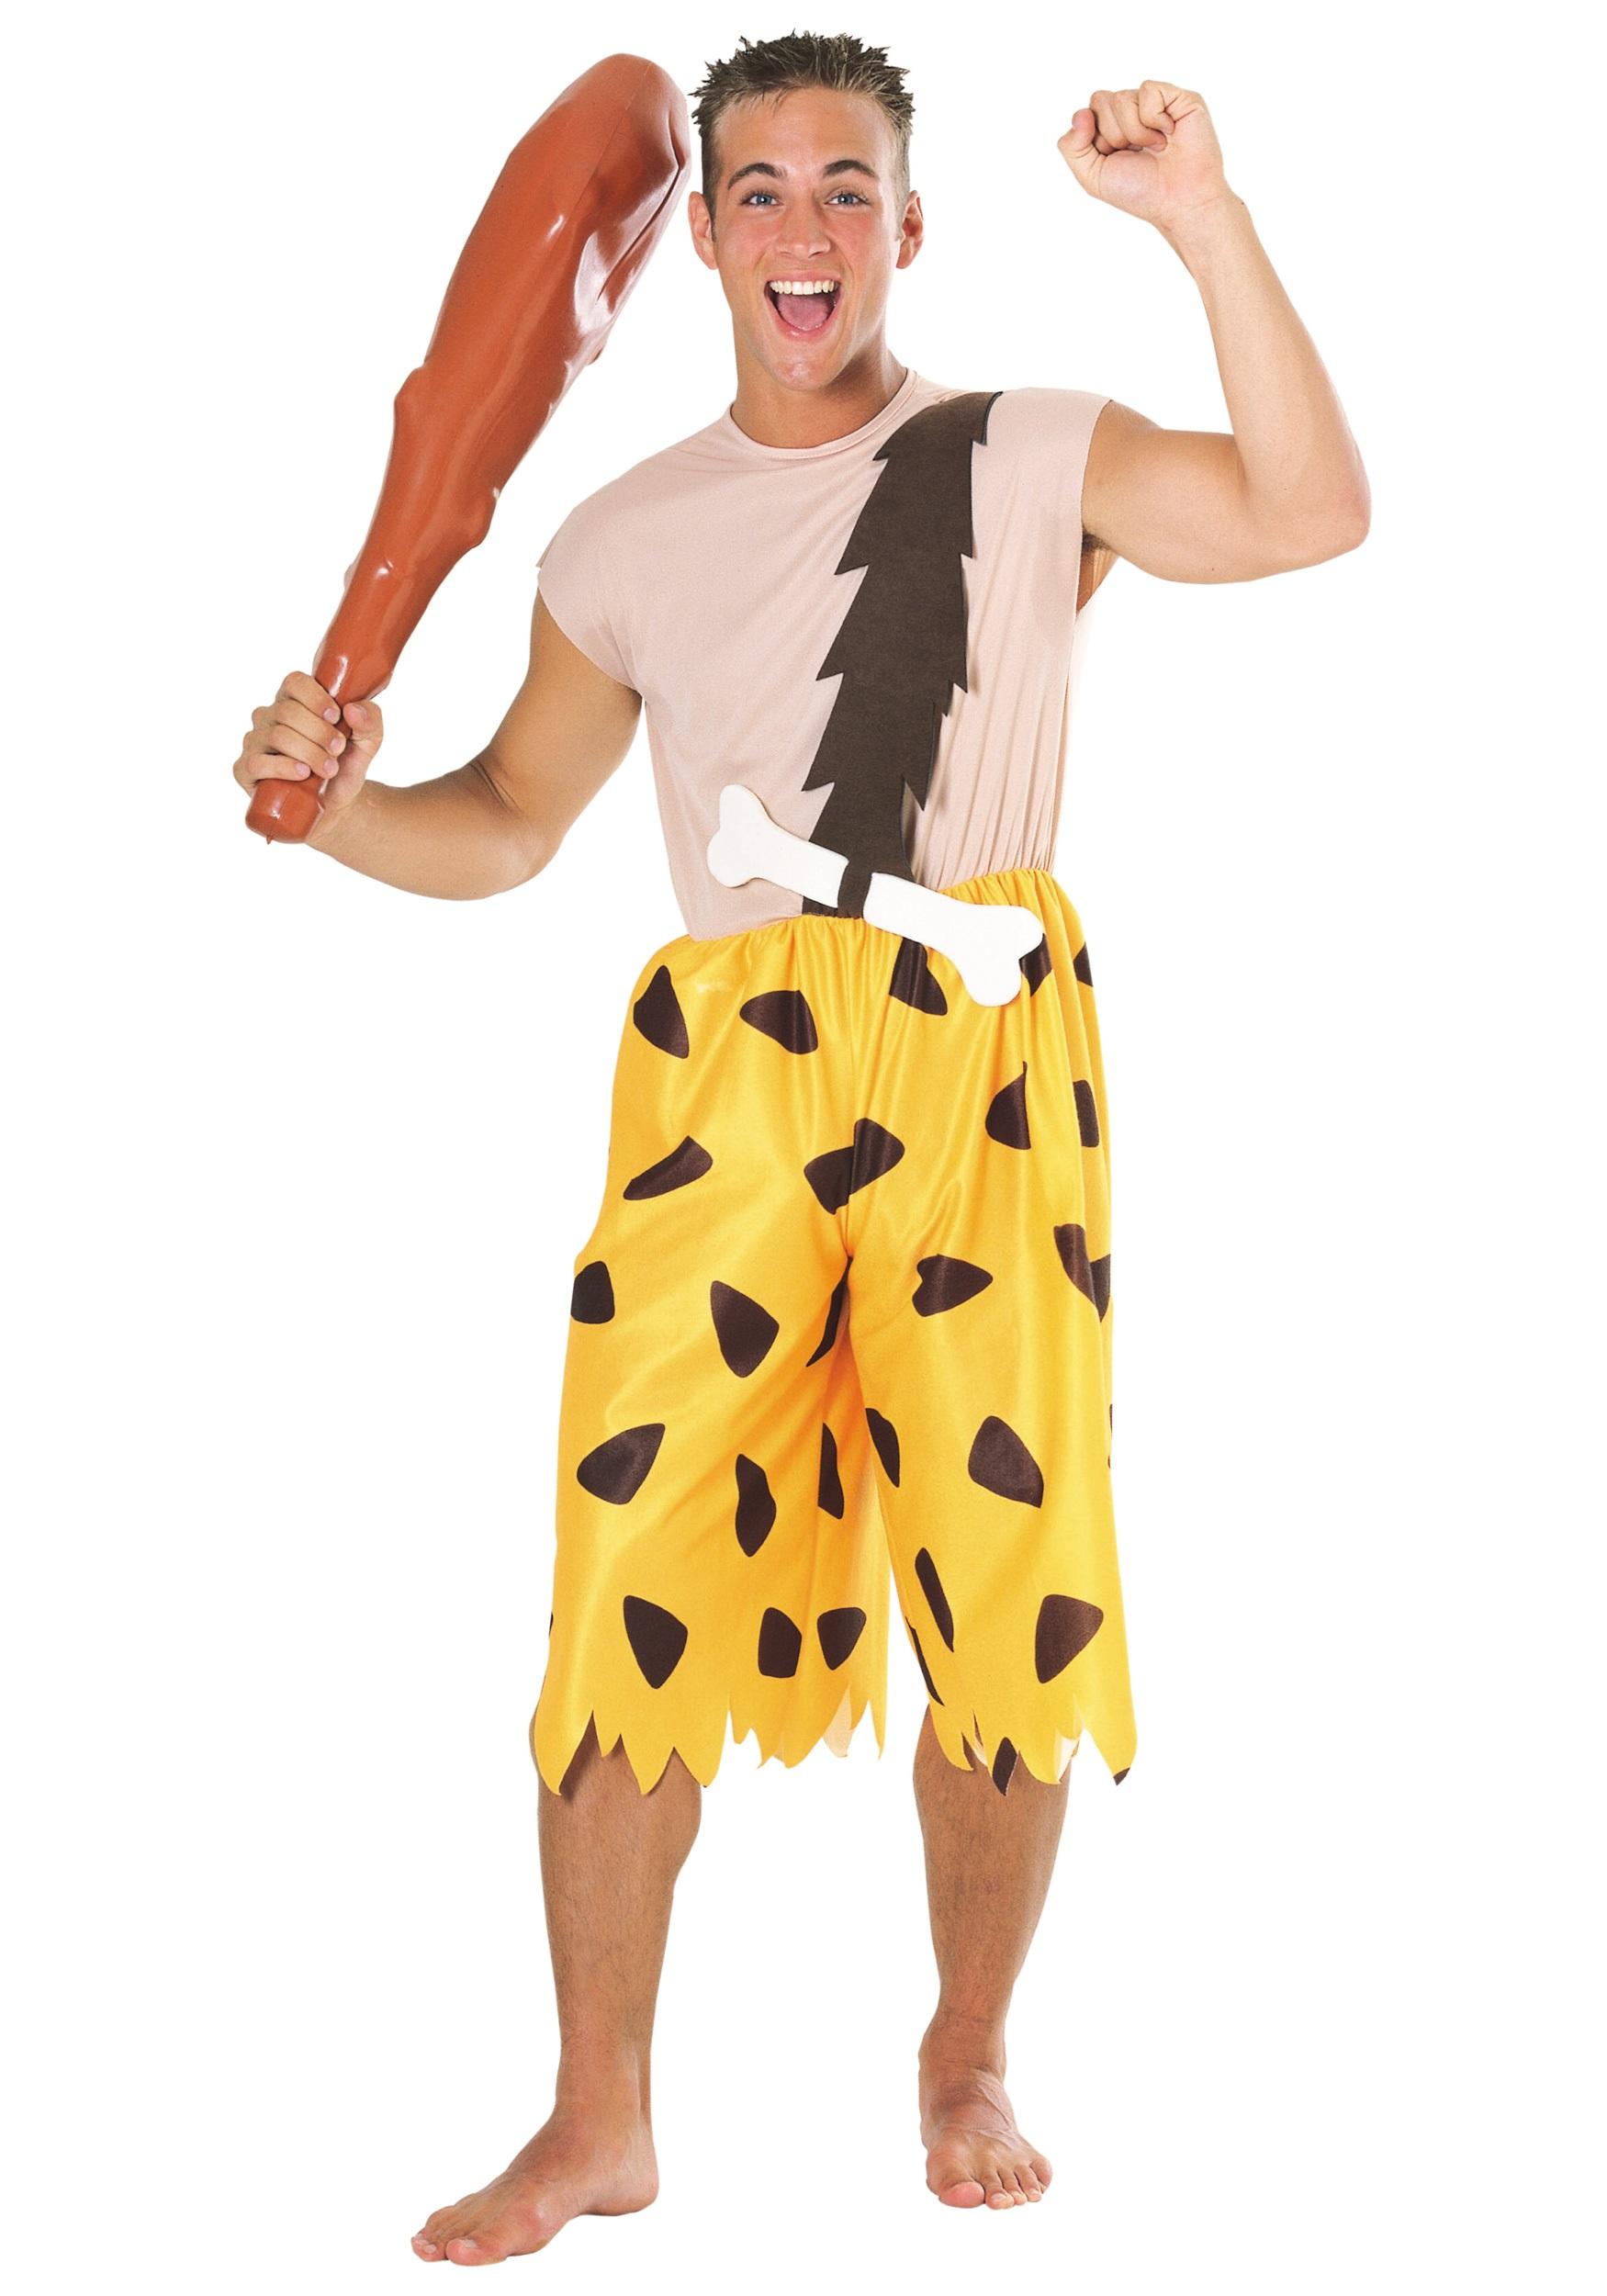 Bamm Bamm Adult Costume  sc 1 st  Halloween Costumes & Bamm-Bamm Adult Costume